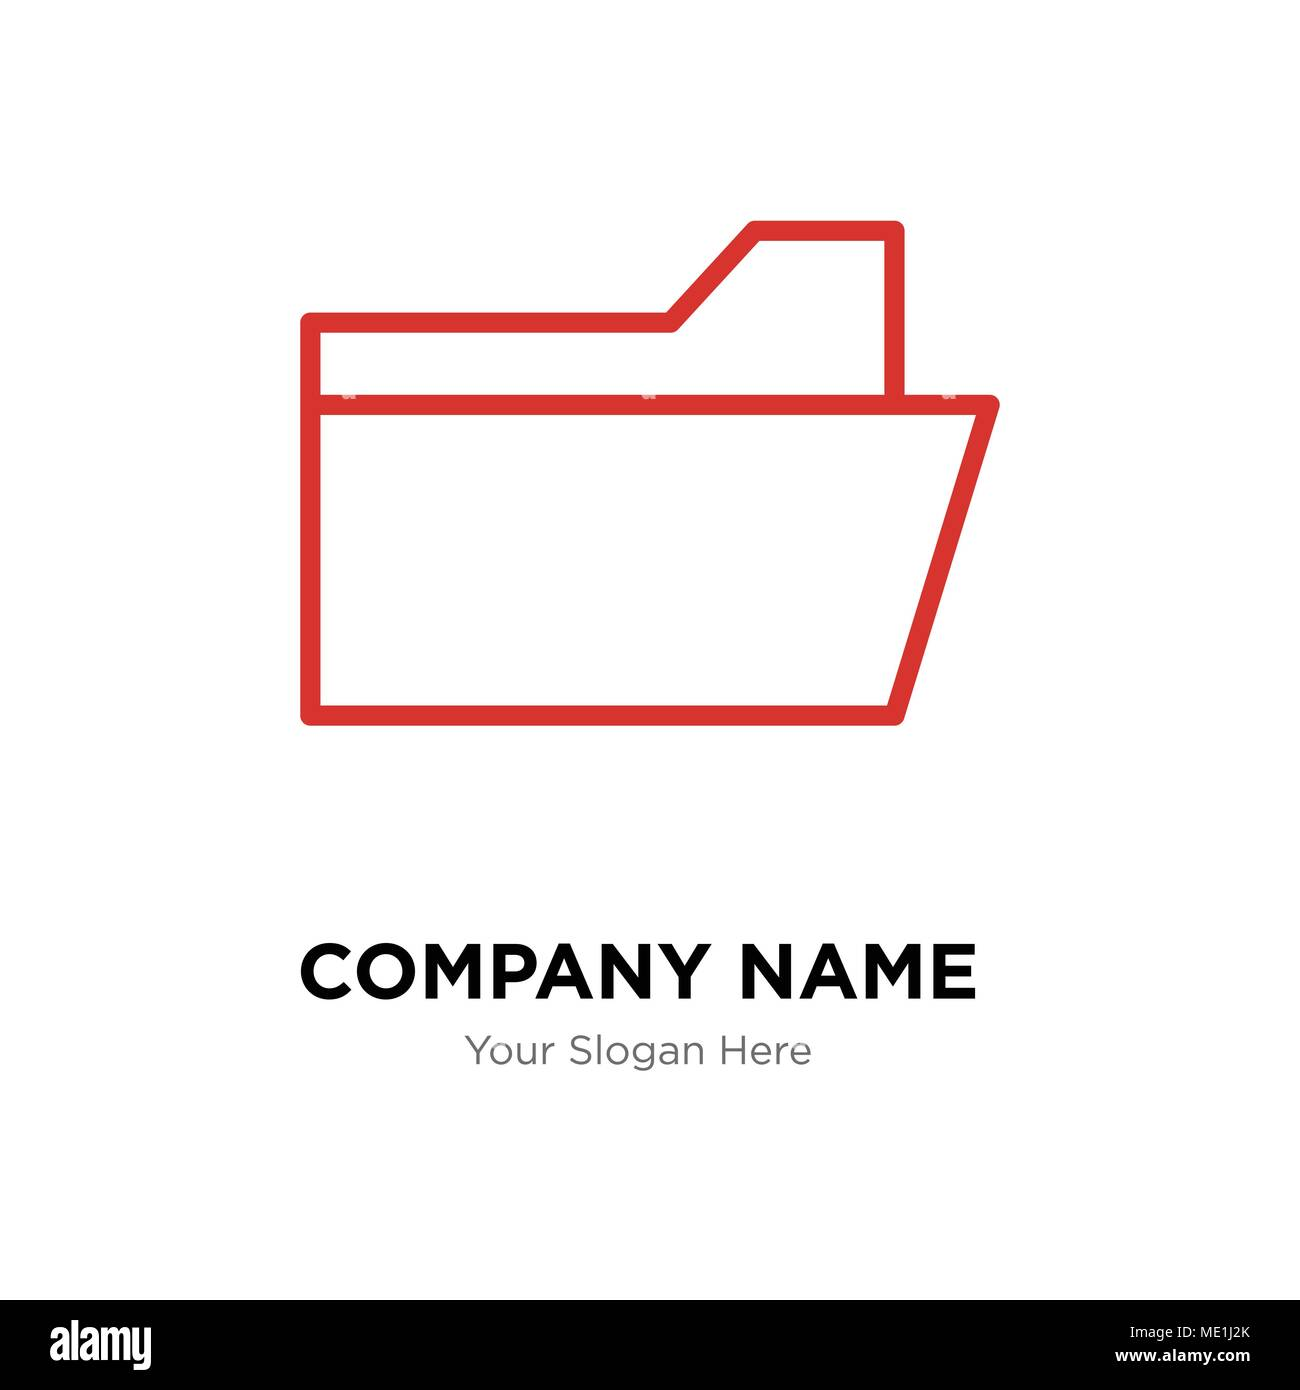 File folder company logo design template business corporate vector file folder company logo design template business corporate vector icon maxwellsz